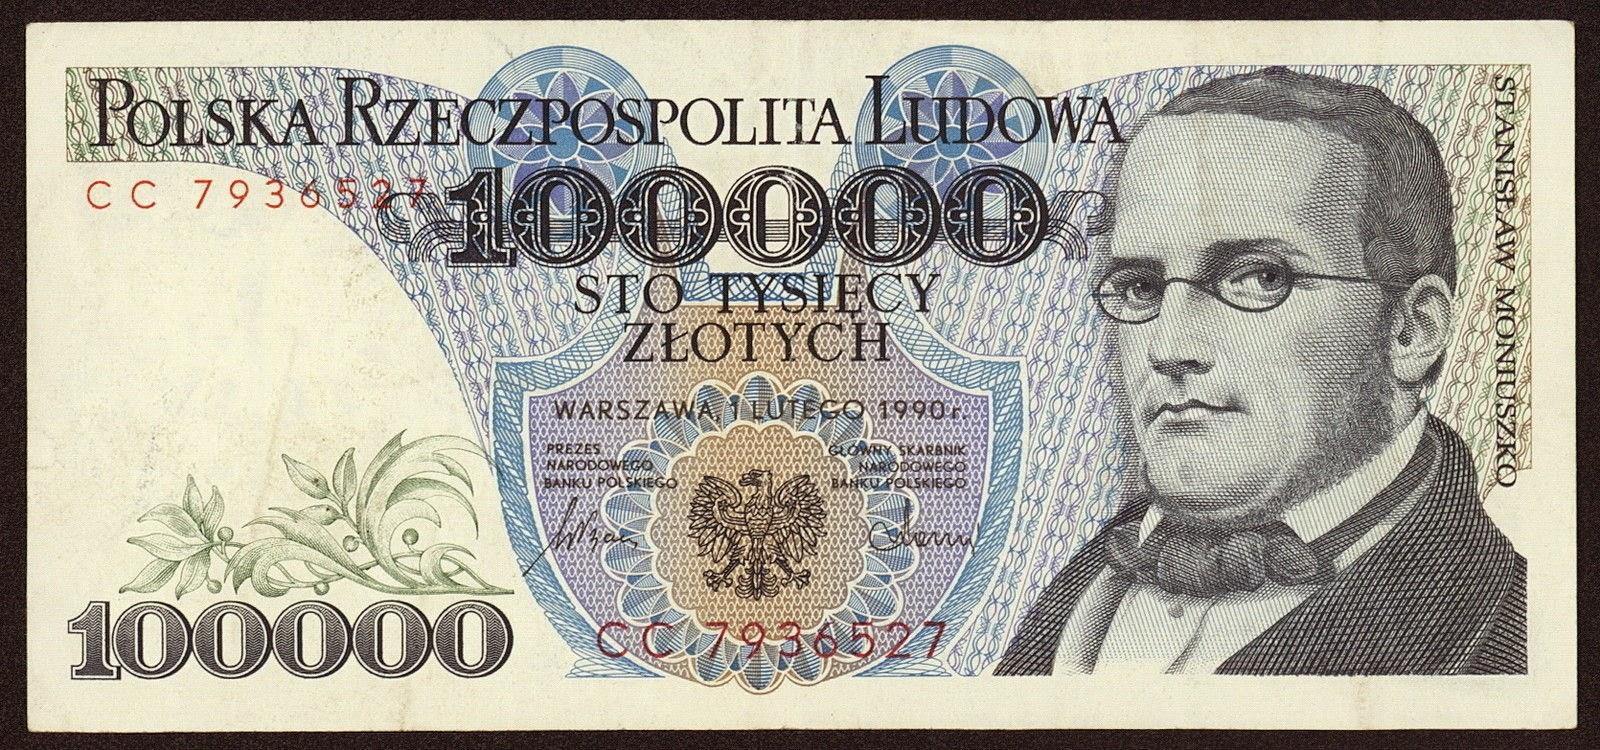 Poland Banknotes 100000 Zloty banknote 1990 Stanislaw Moniuszko